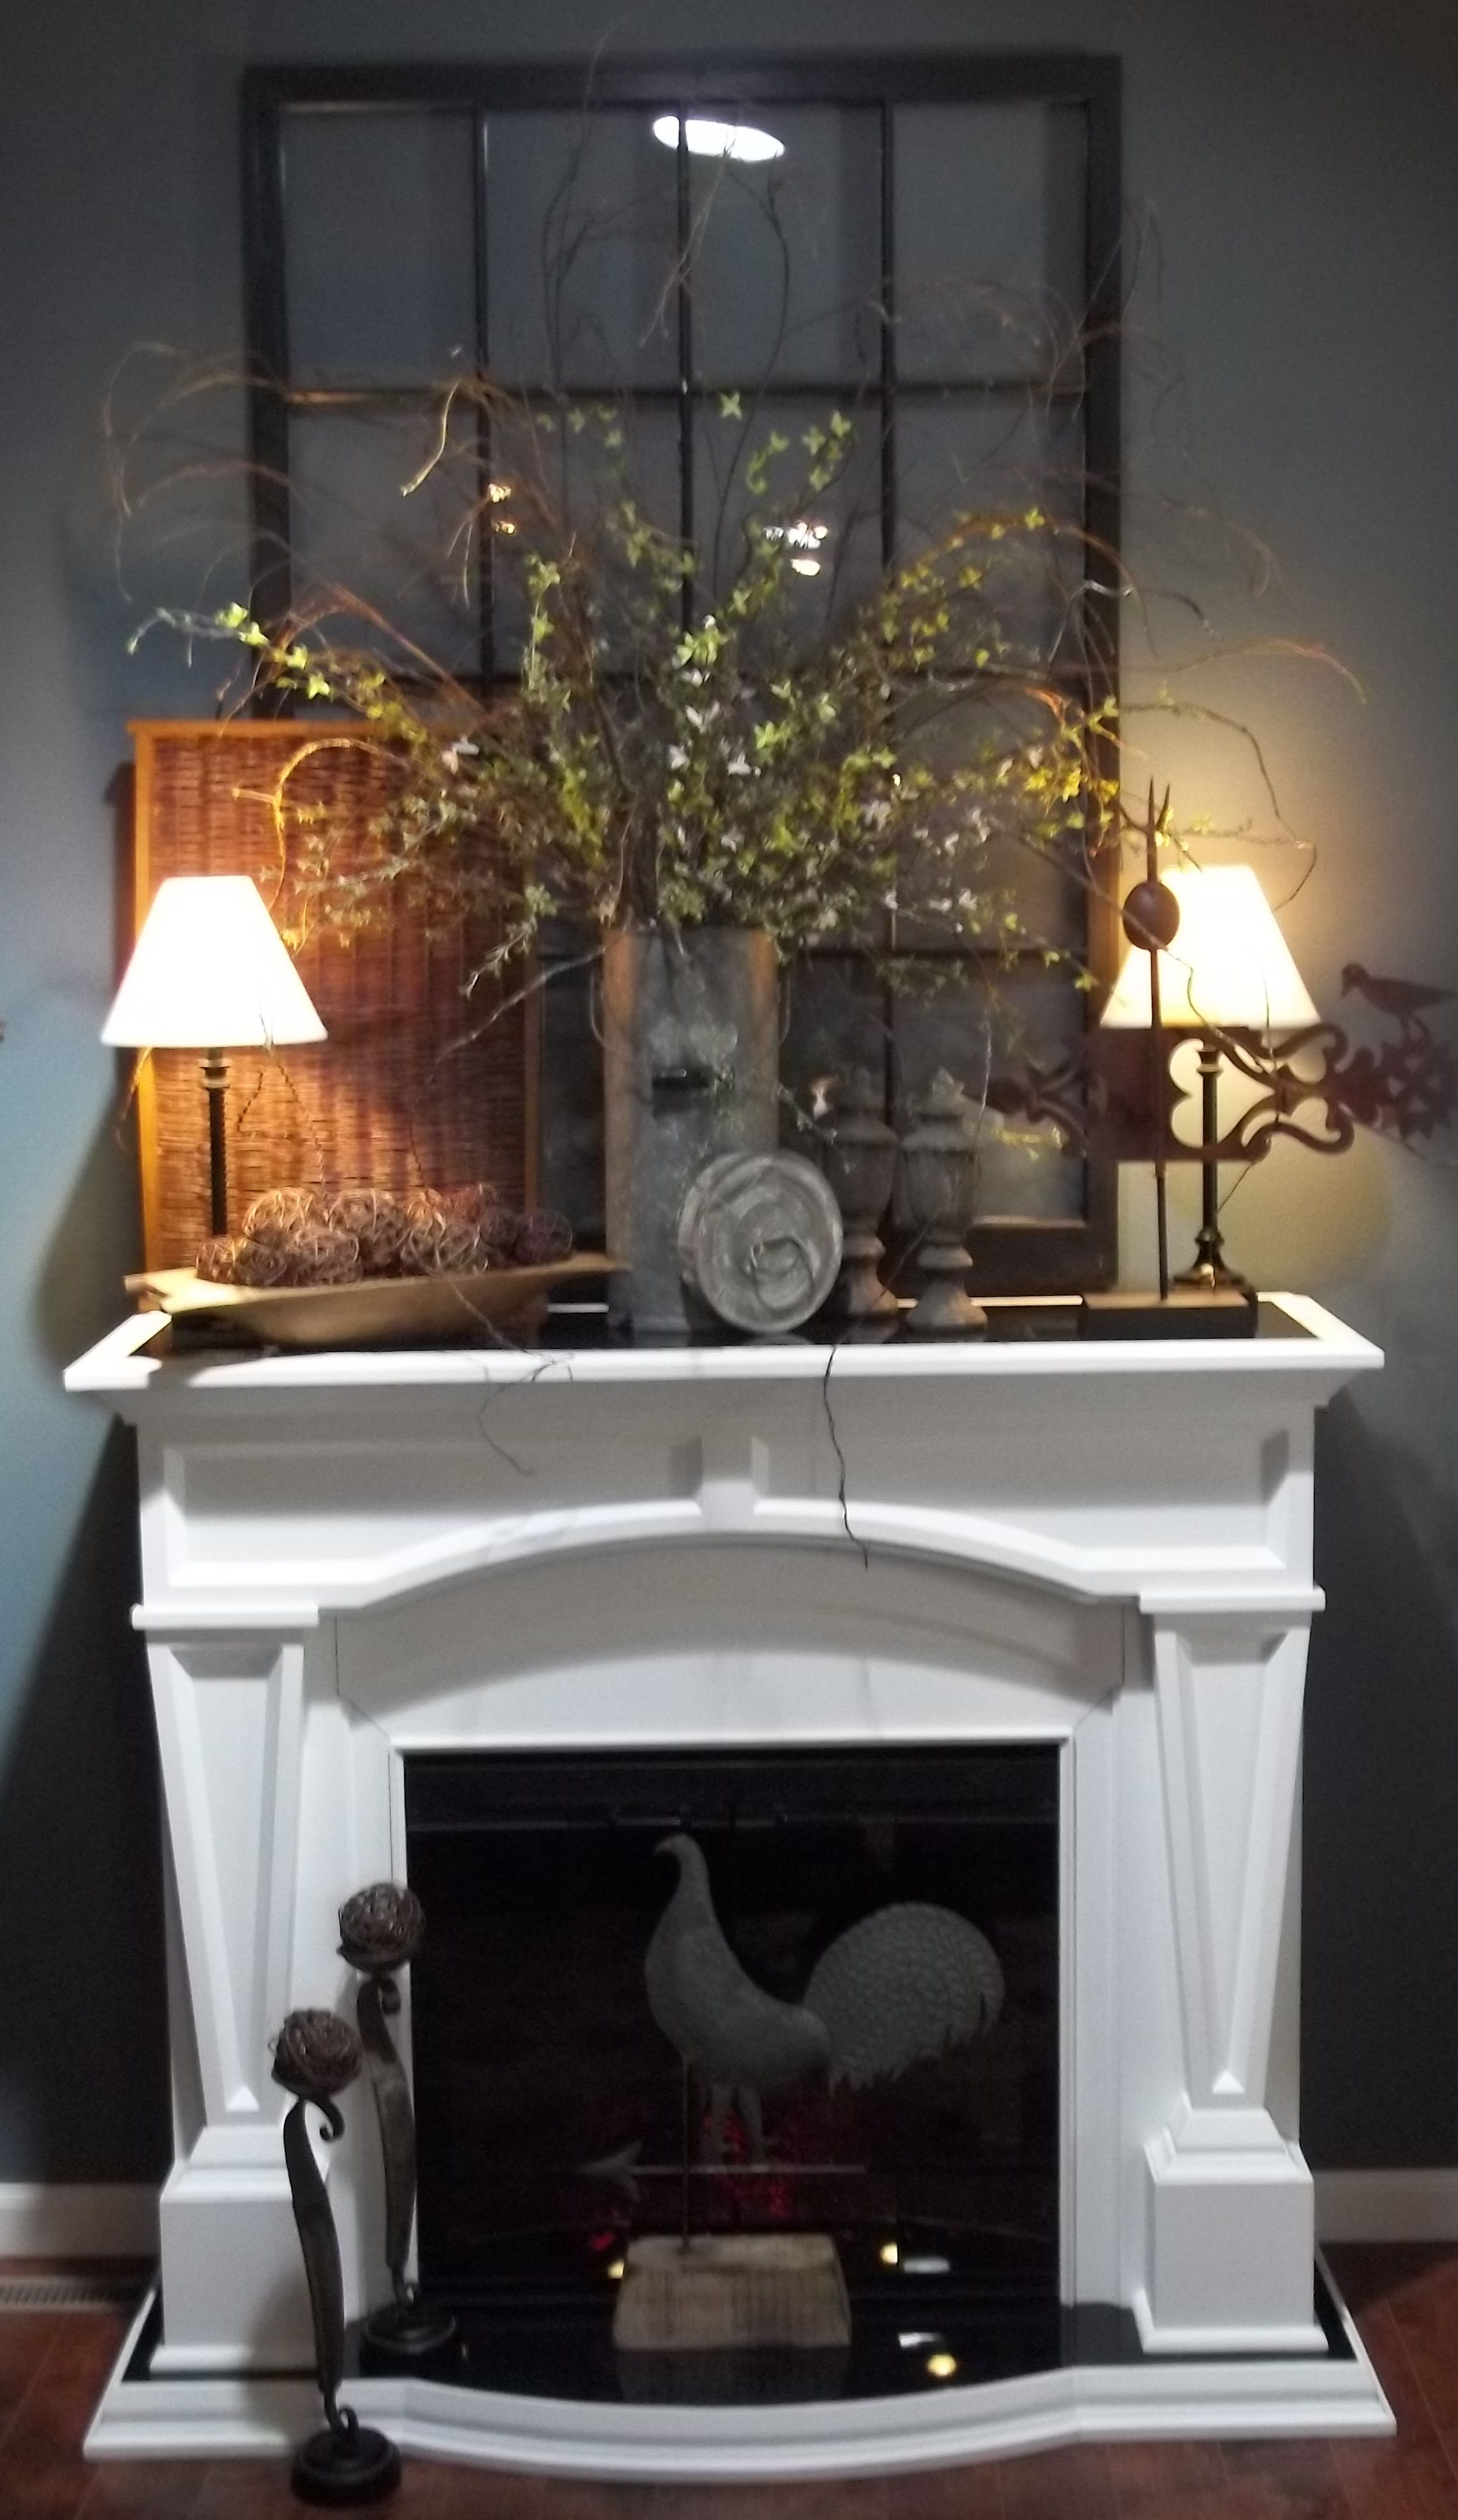 primitive mantle decor on primitive fireplace decor fireplace mantel decor fireplace mantle decor modern fireplace decor fireplace mantel decor